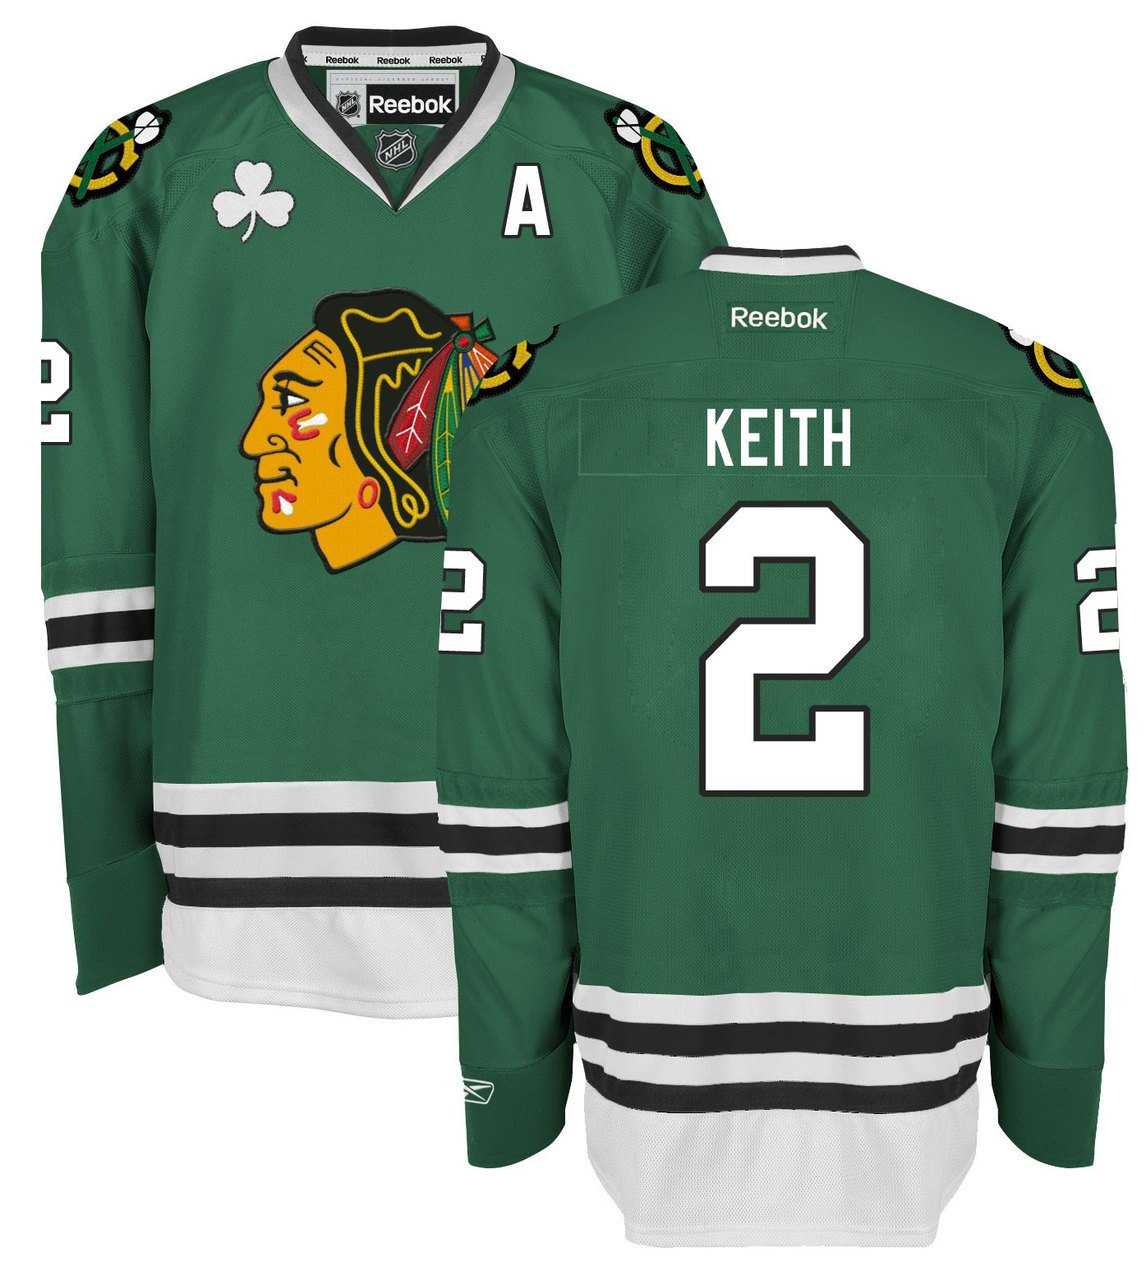 Amazon.com   Duncan Keith Chicago Blackhawks Green Premier Jersey by Reebok    Sports   Outdoors e599d51b059